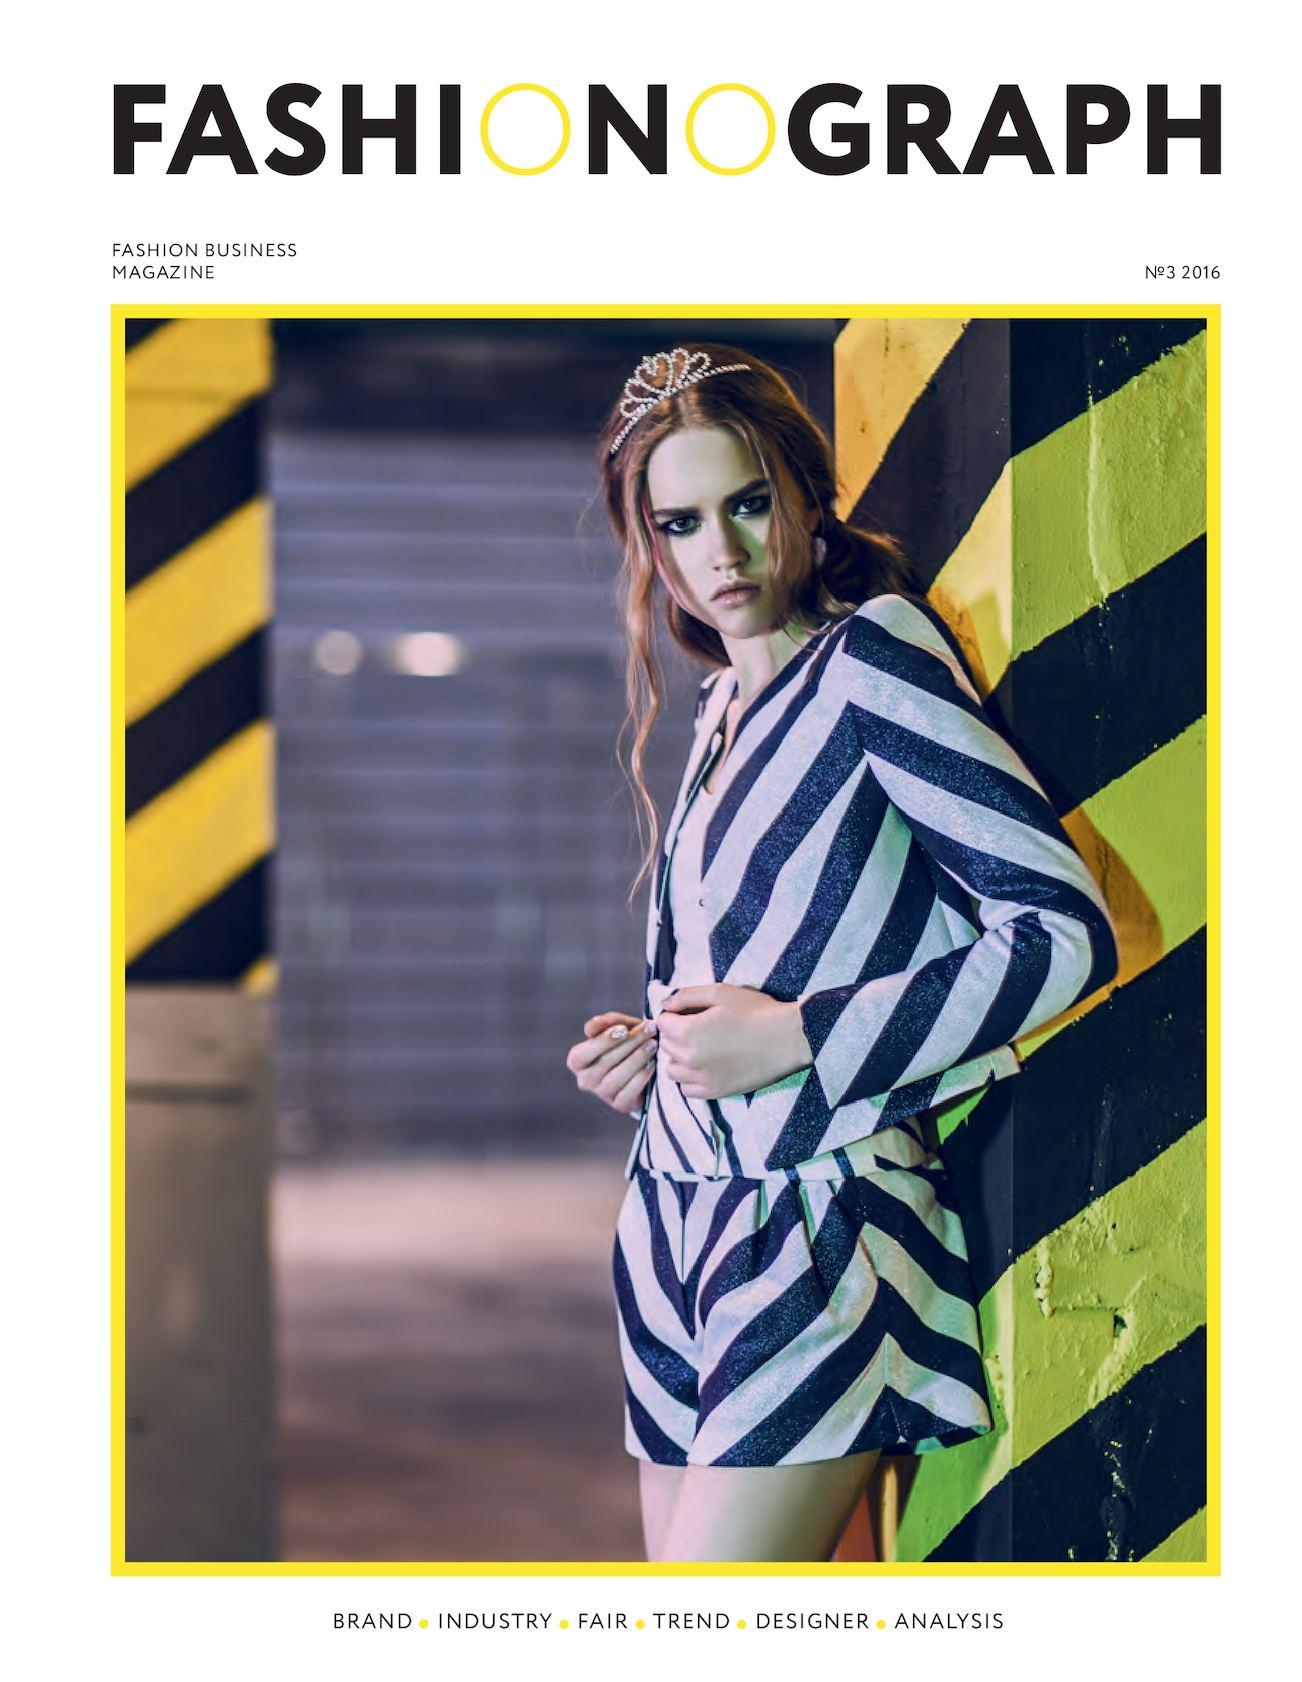 Calaméo - Fashionograph  3 Dbl. edition 2016 c766078b5c0